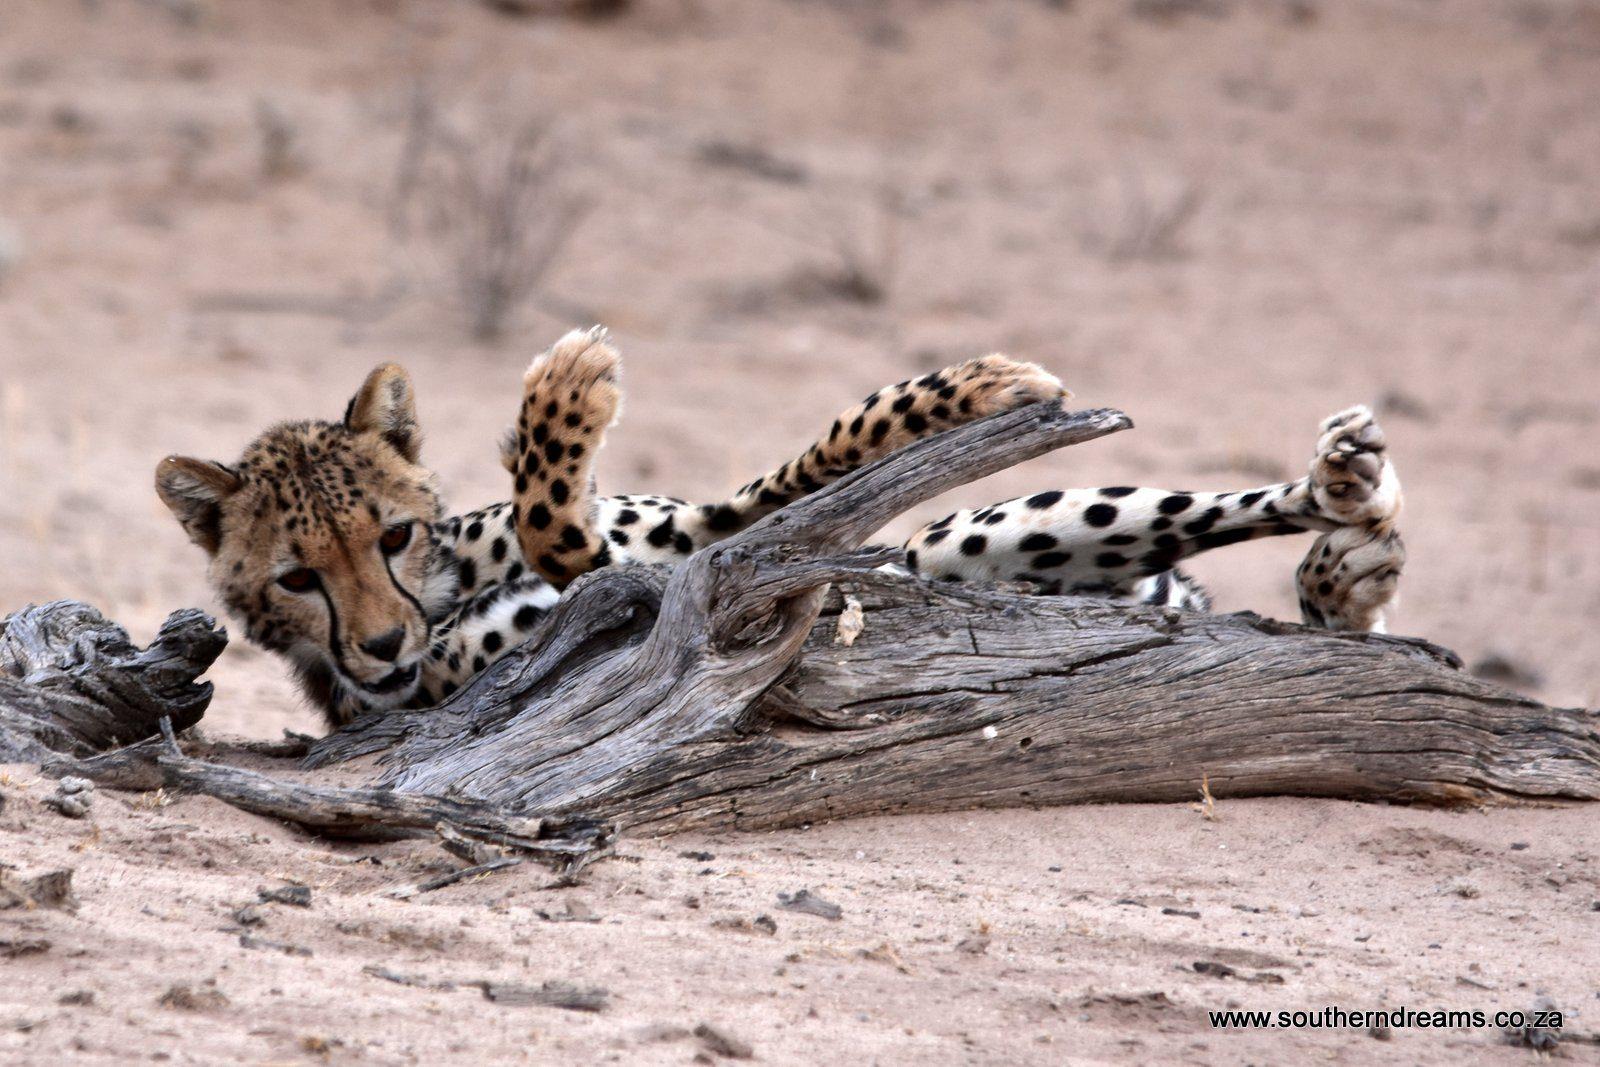 Kgalagadi Cheetah – Corinne and her Scallywags